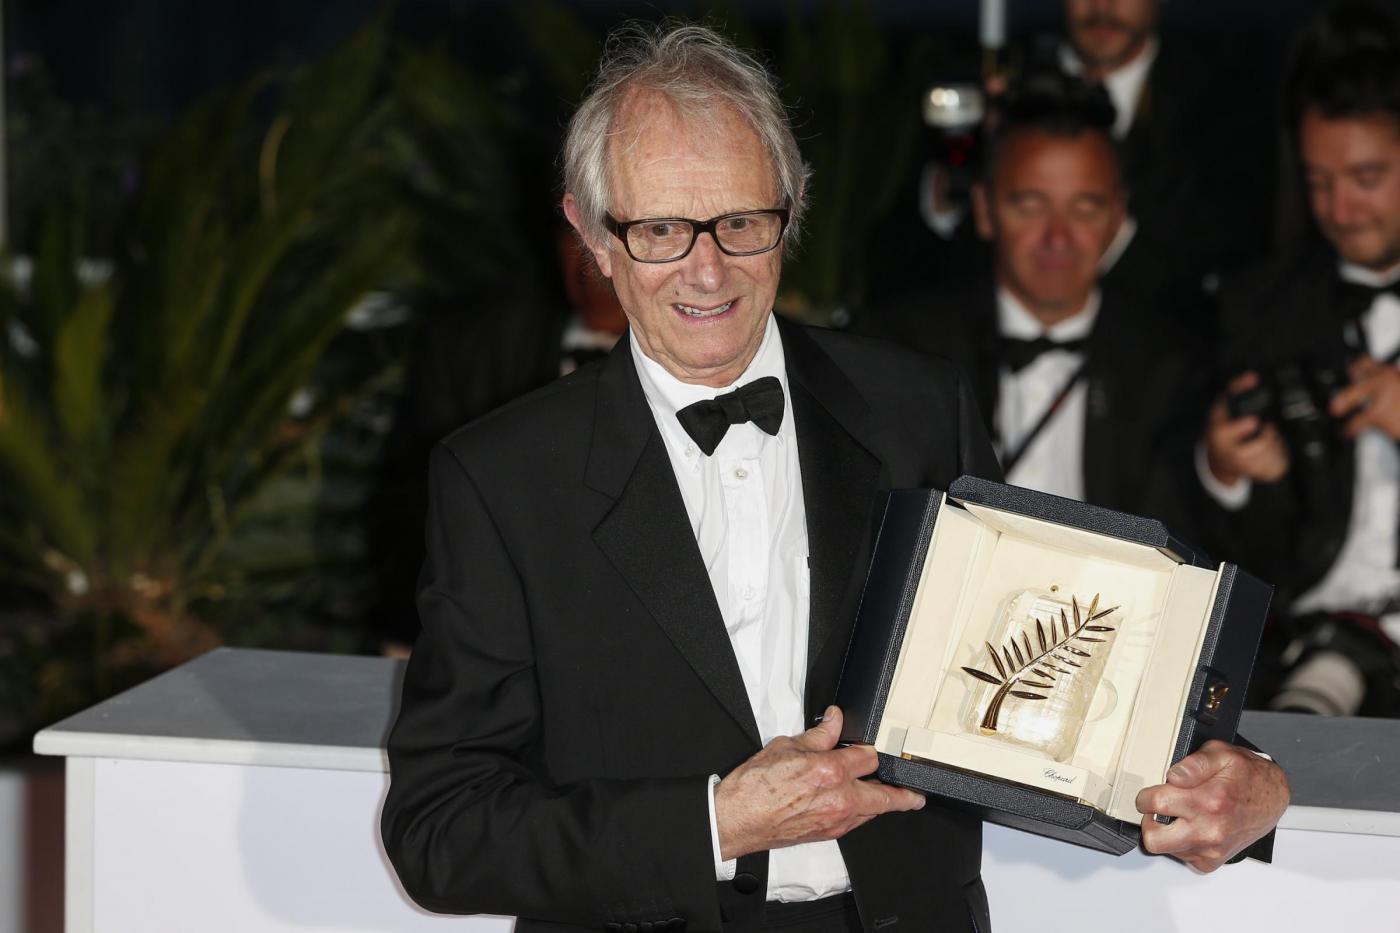 Cannes 2016 vincitori: Palma d'oro a Ken Loach con I, Daniel Blake